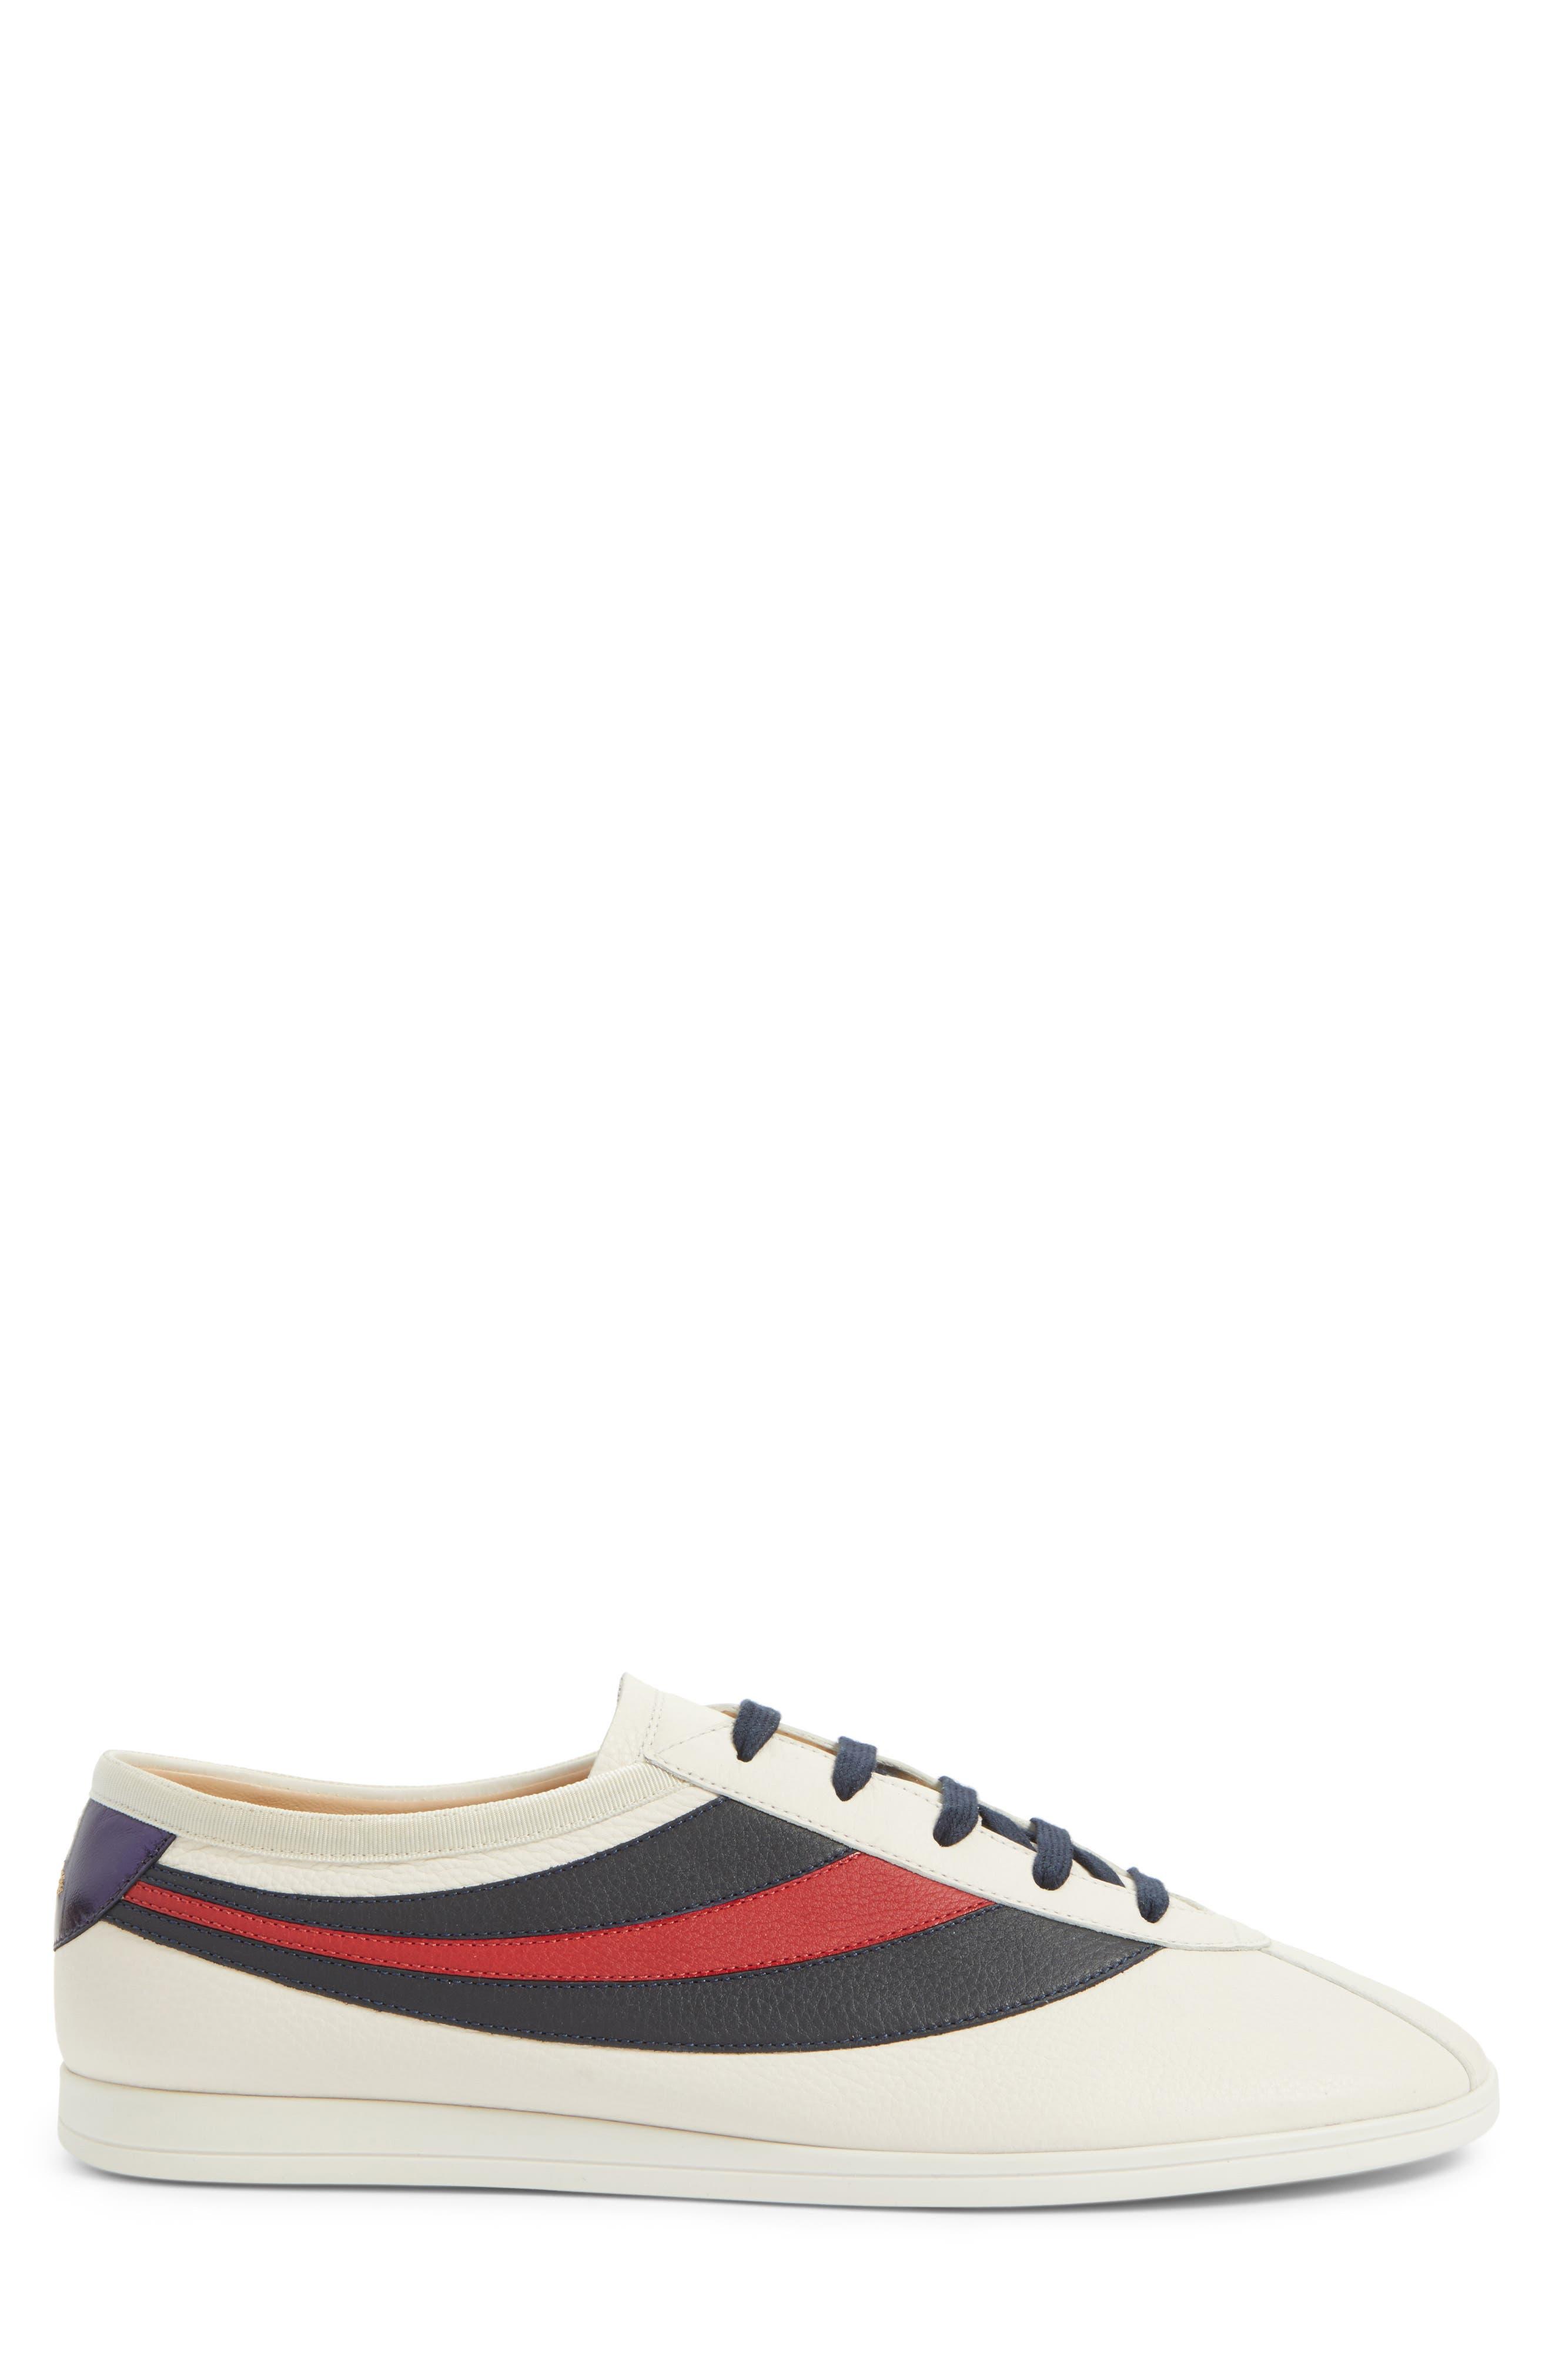 Falacer Sneaker,                             Alternate thumbnail 3, color,                             106